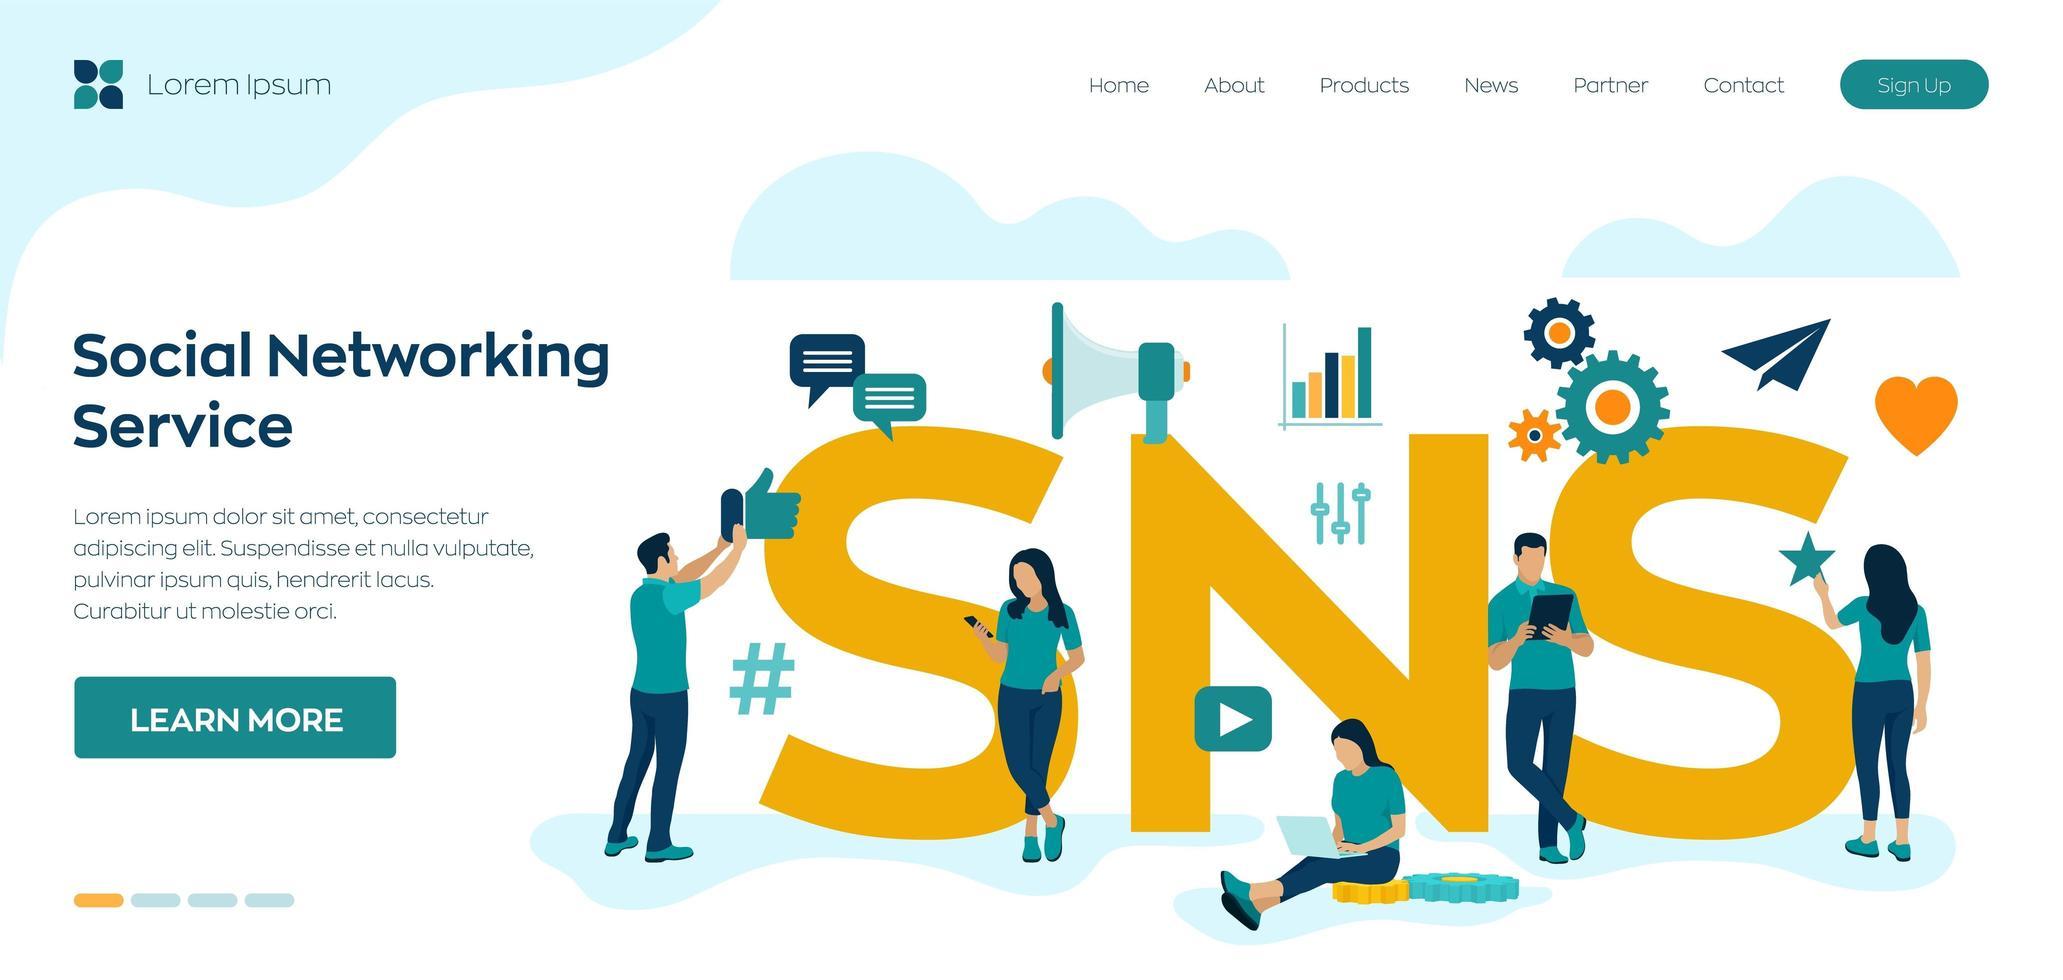 plataforma online de serviço de rede social vetor